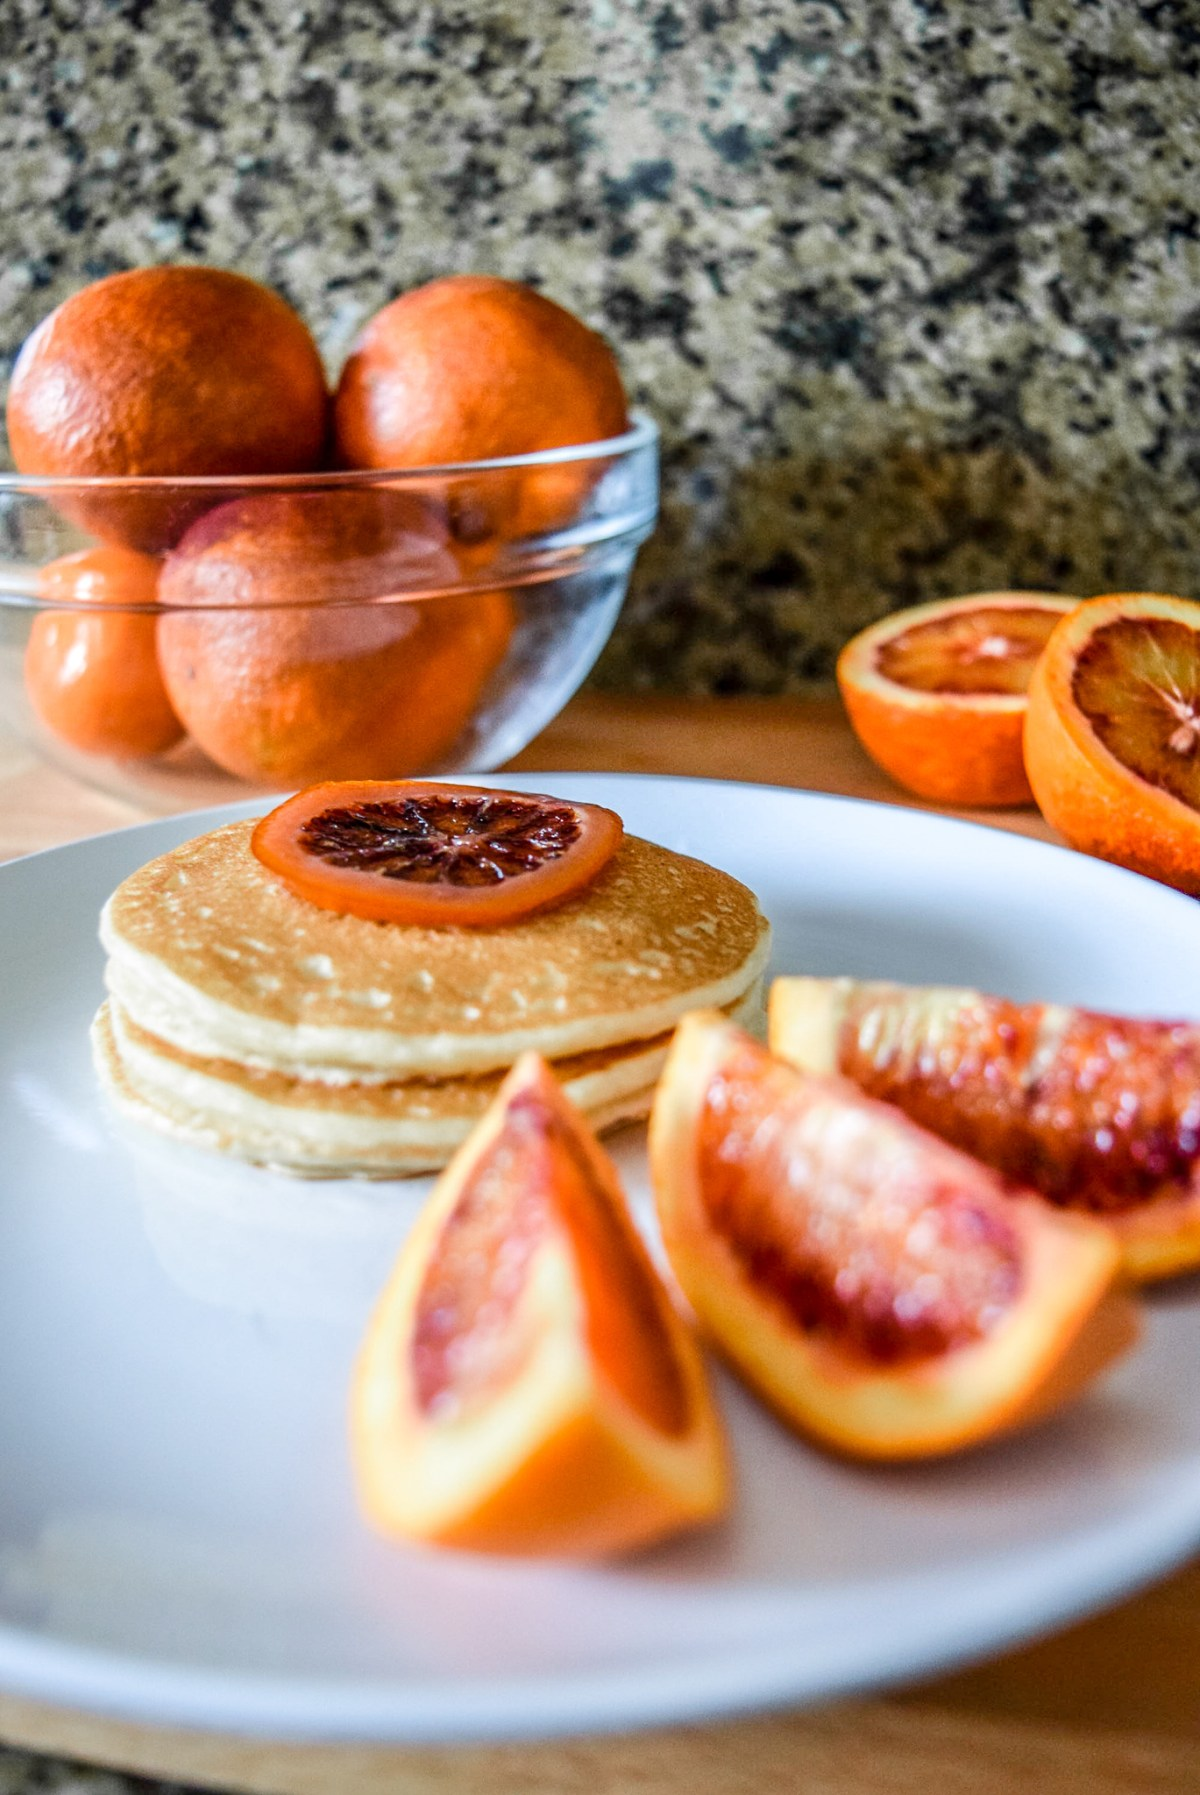 Trader Joe's frozen pancakes with blood orange slices and candied blood orange round garnish from front